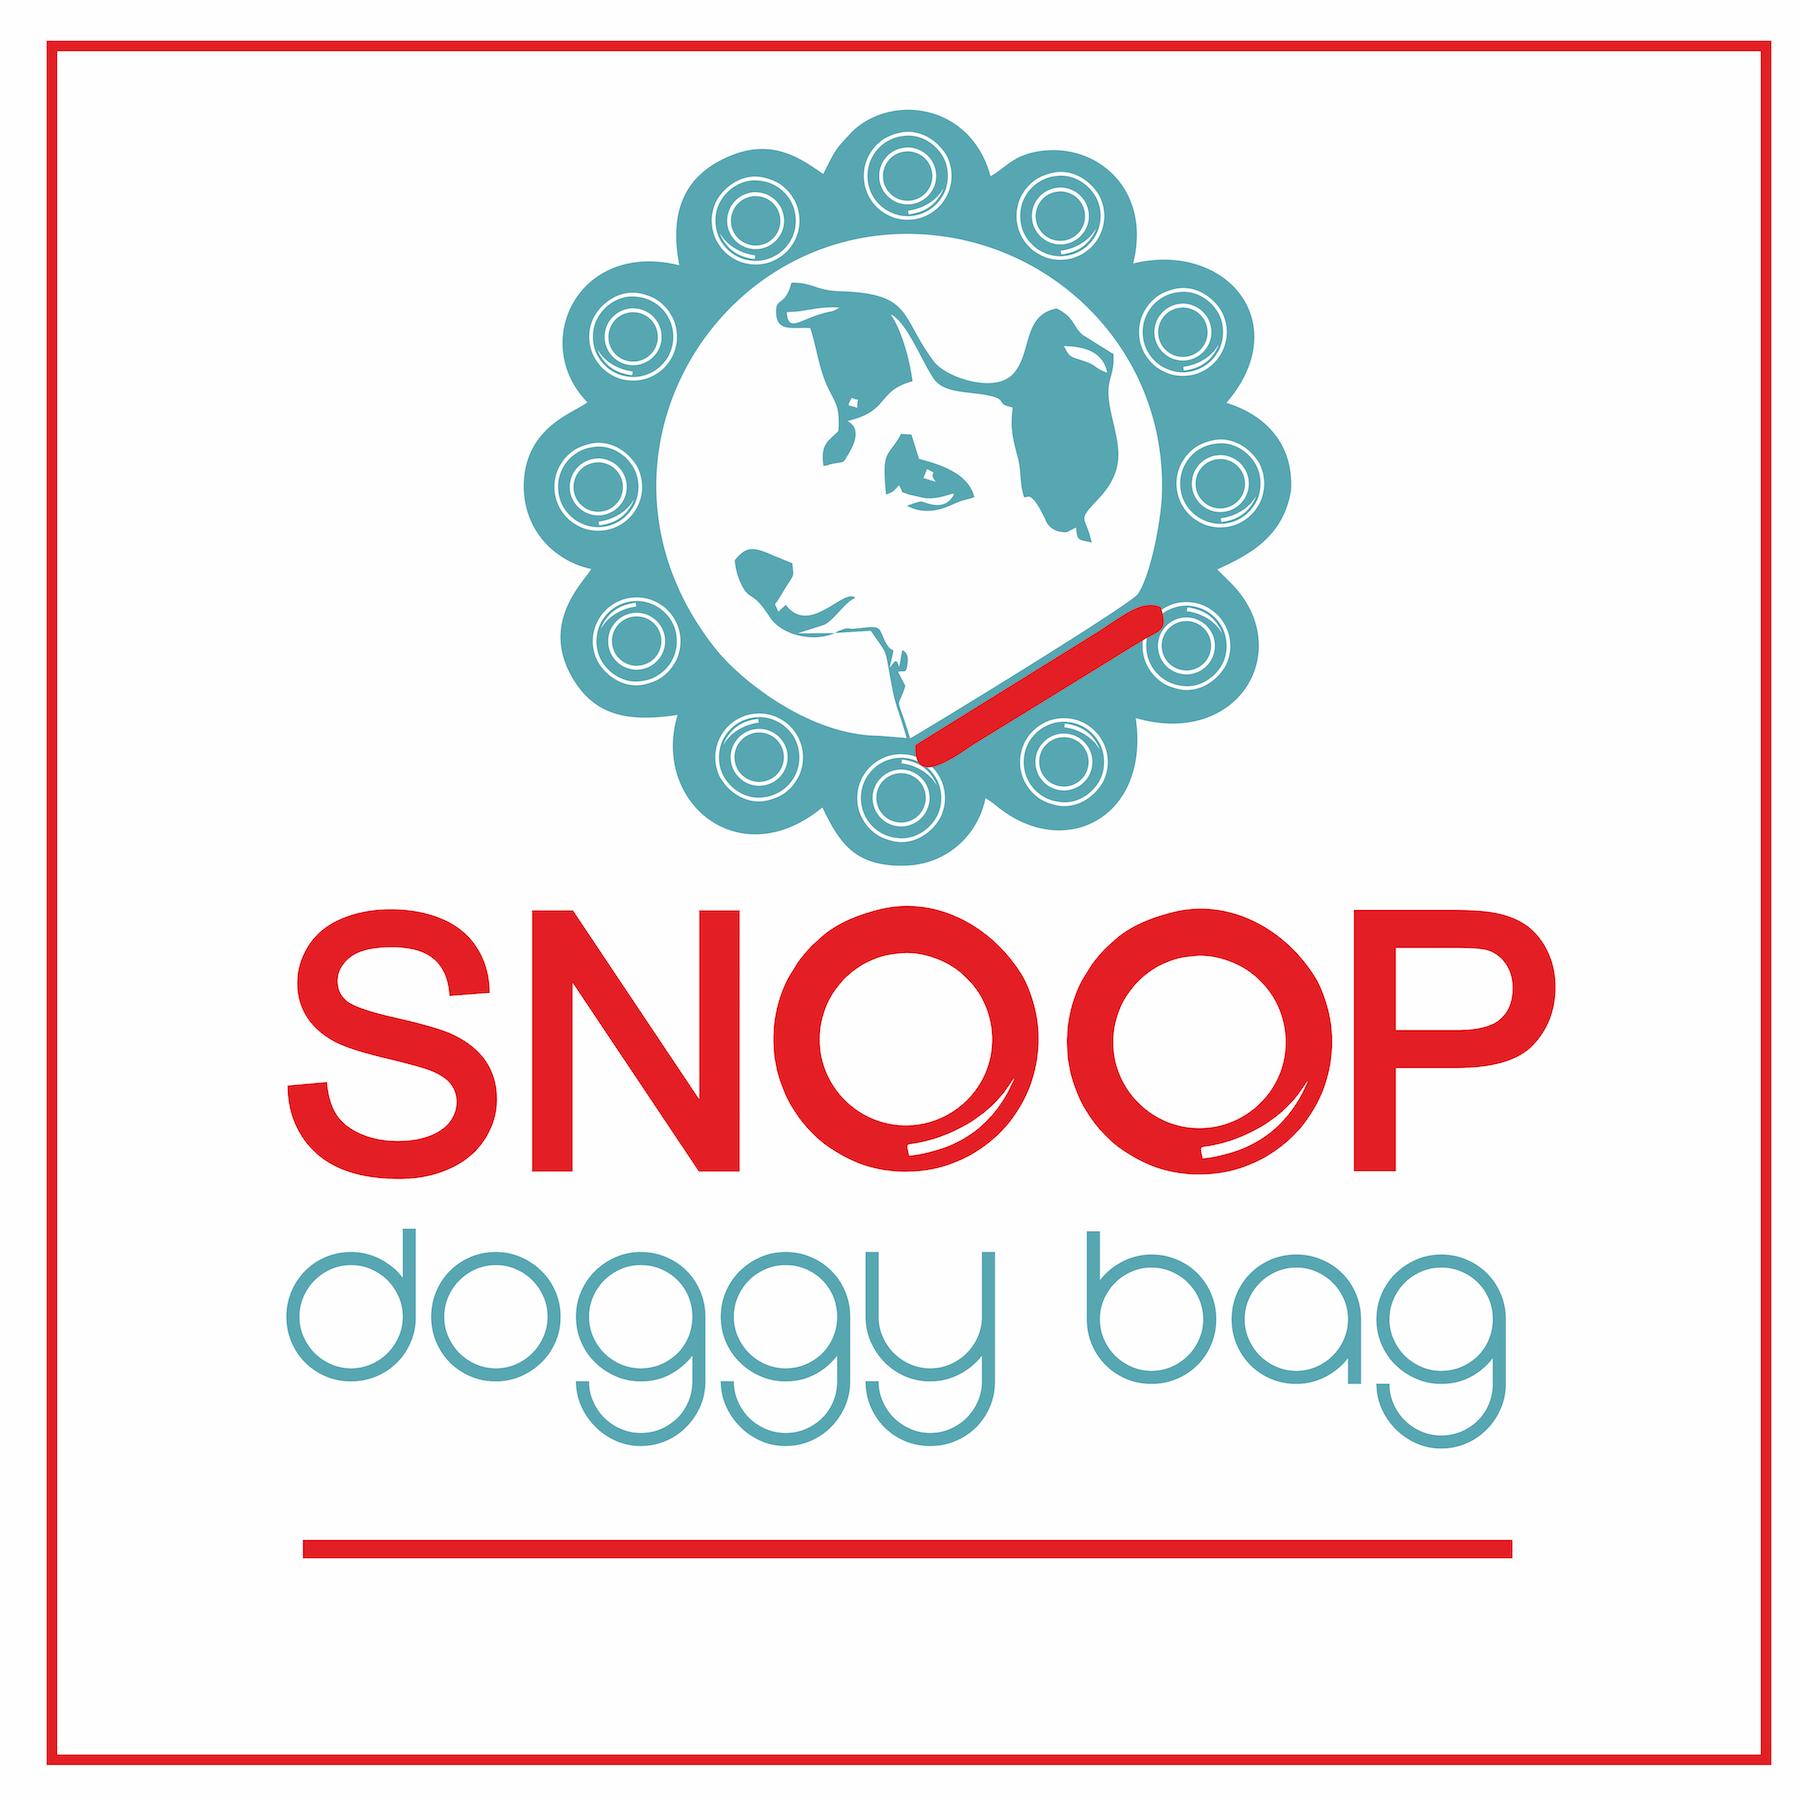 SNOOP Doggy Bag